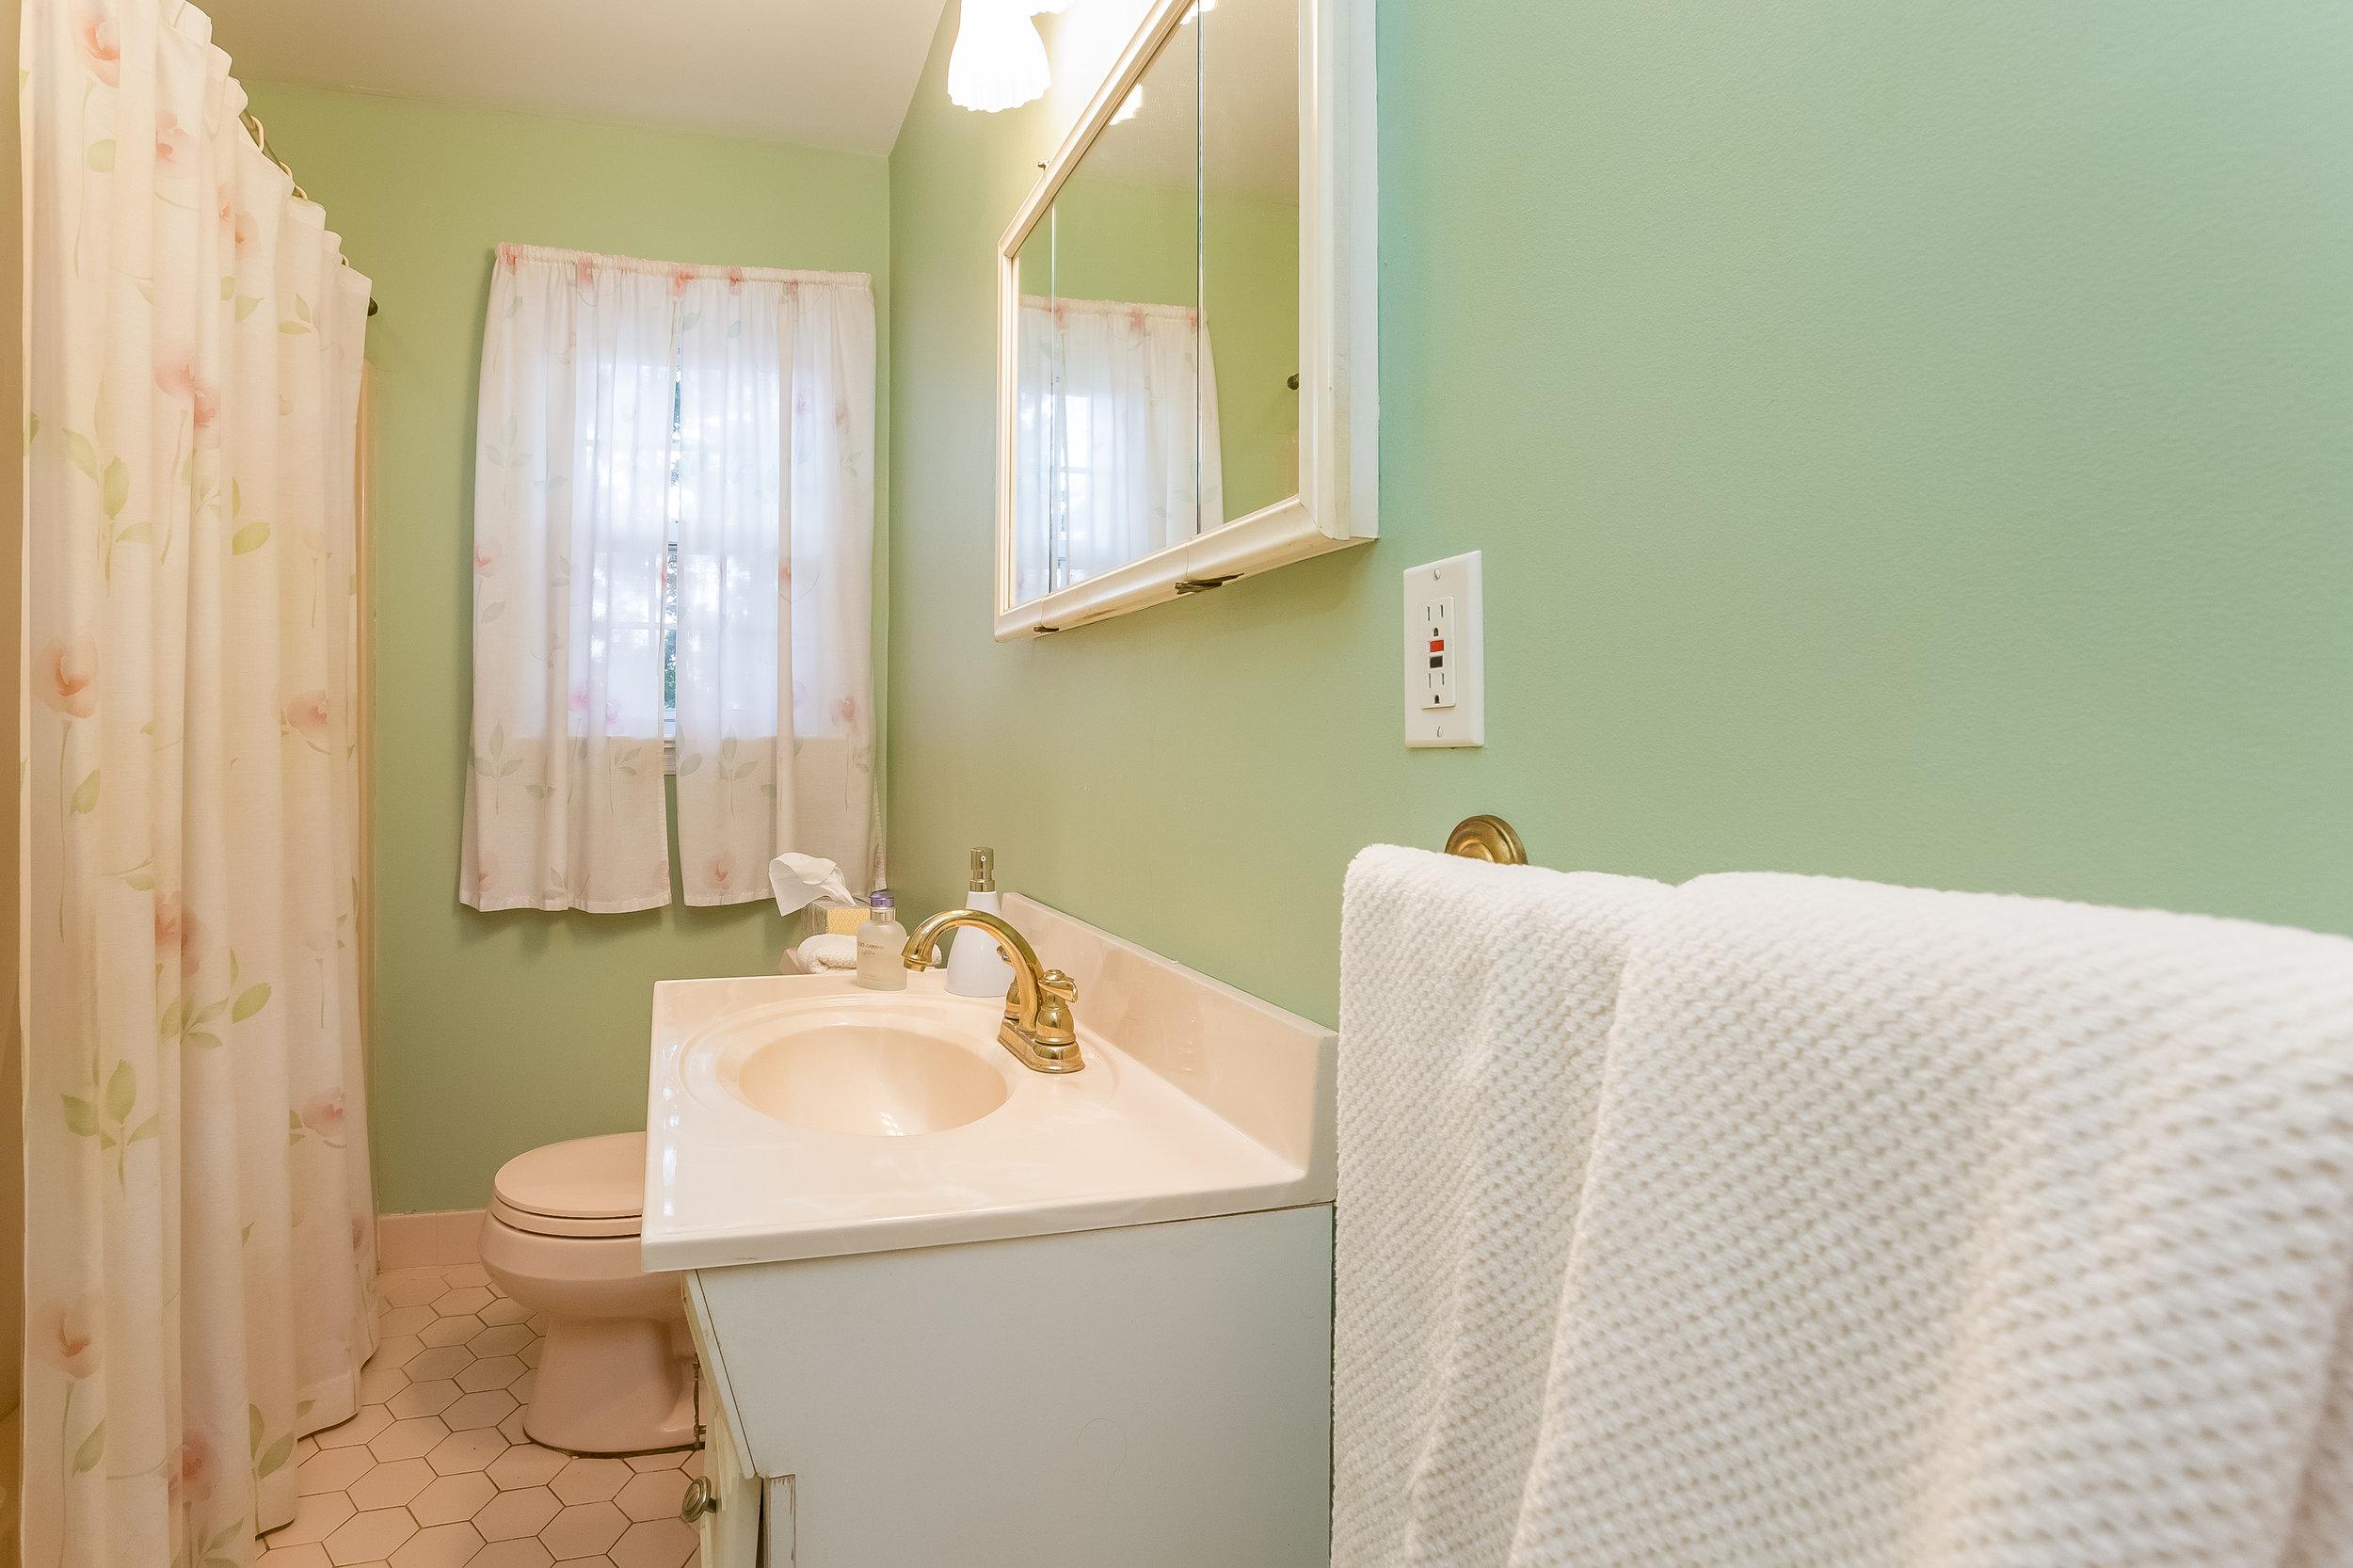 024-Bathroom-5002137-large.jpg